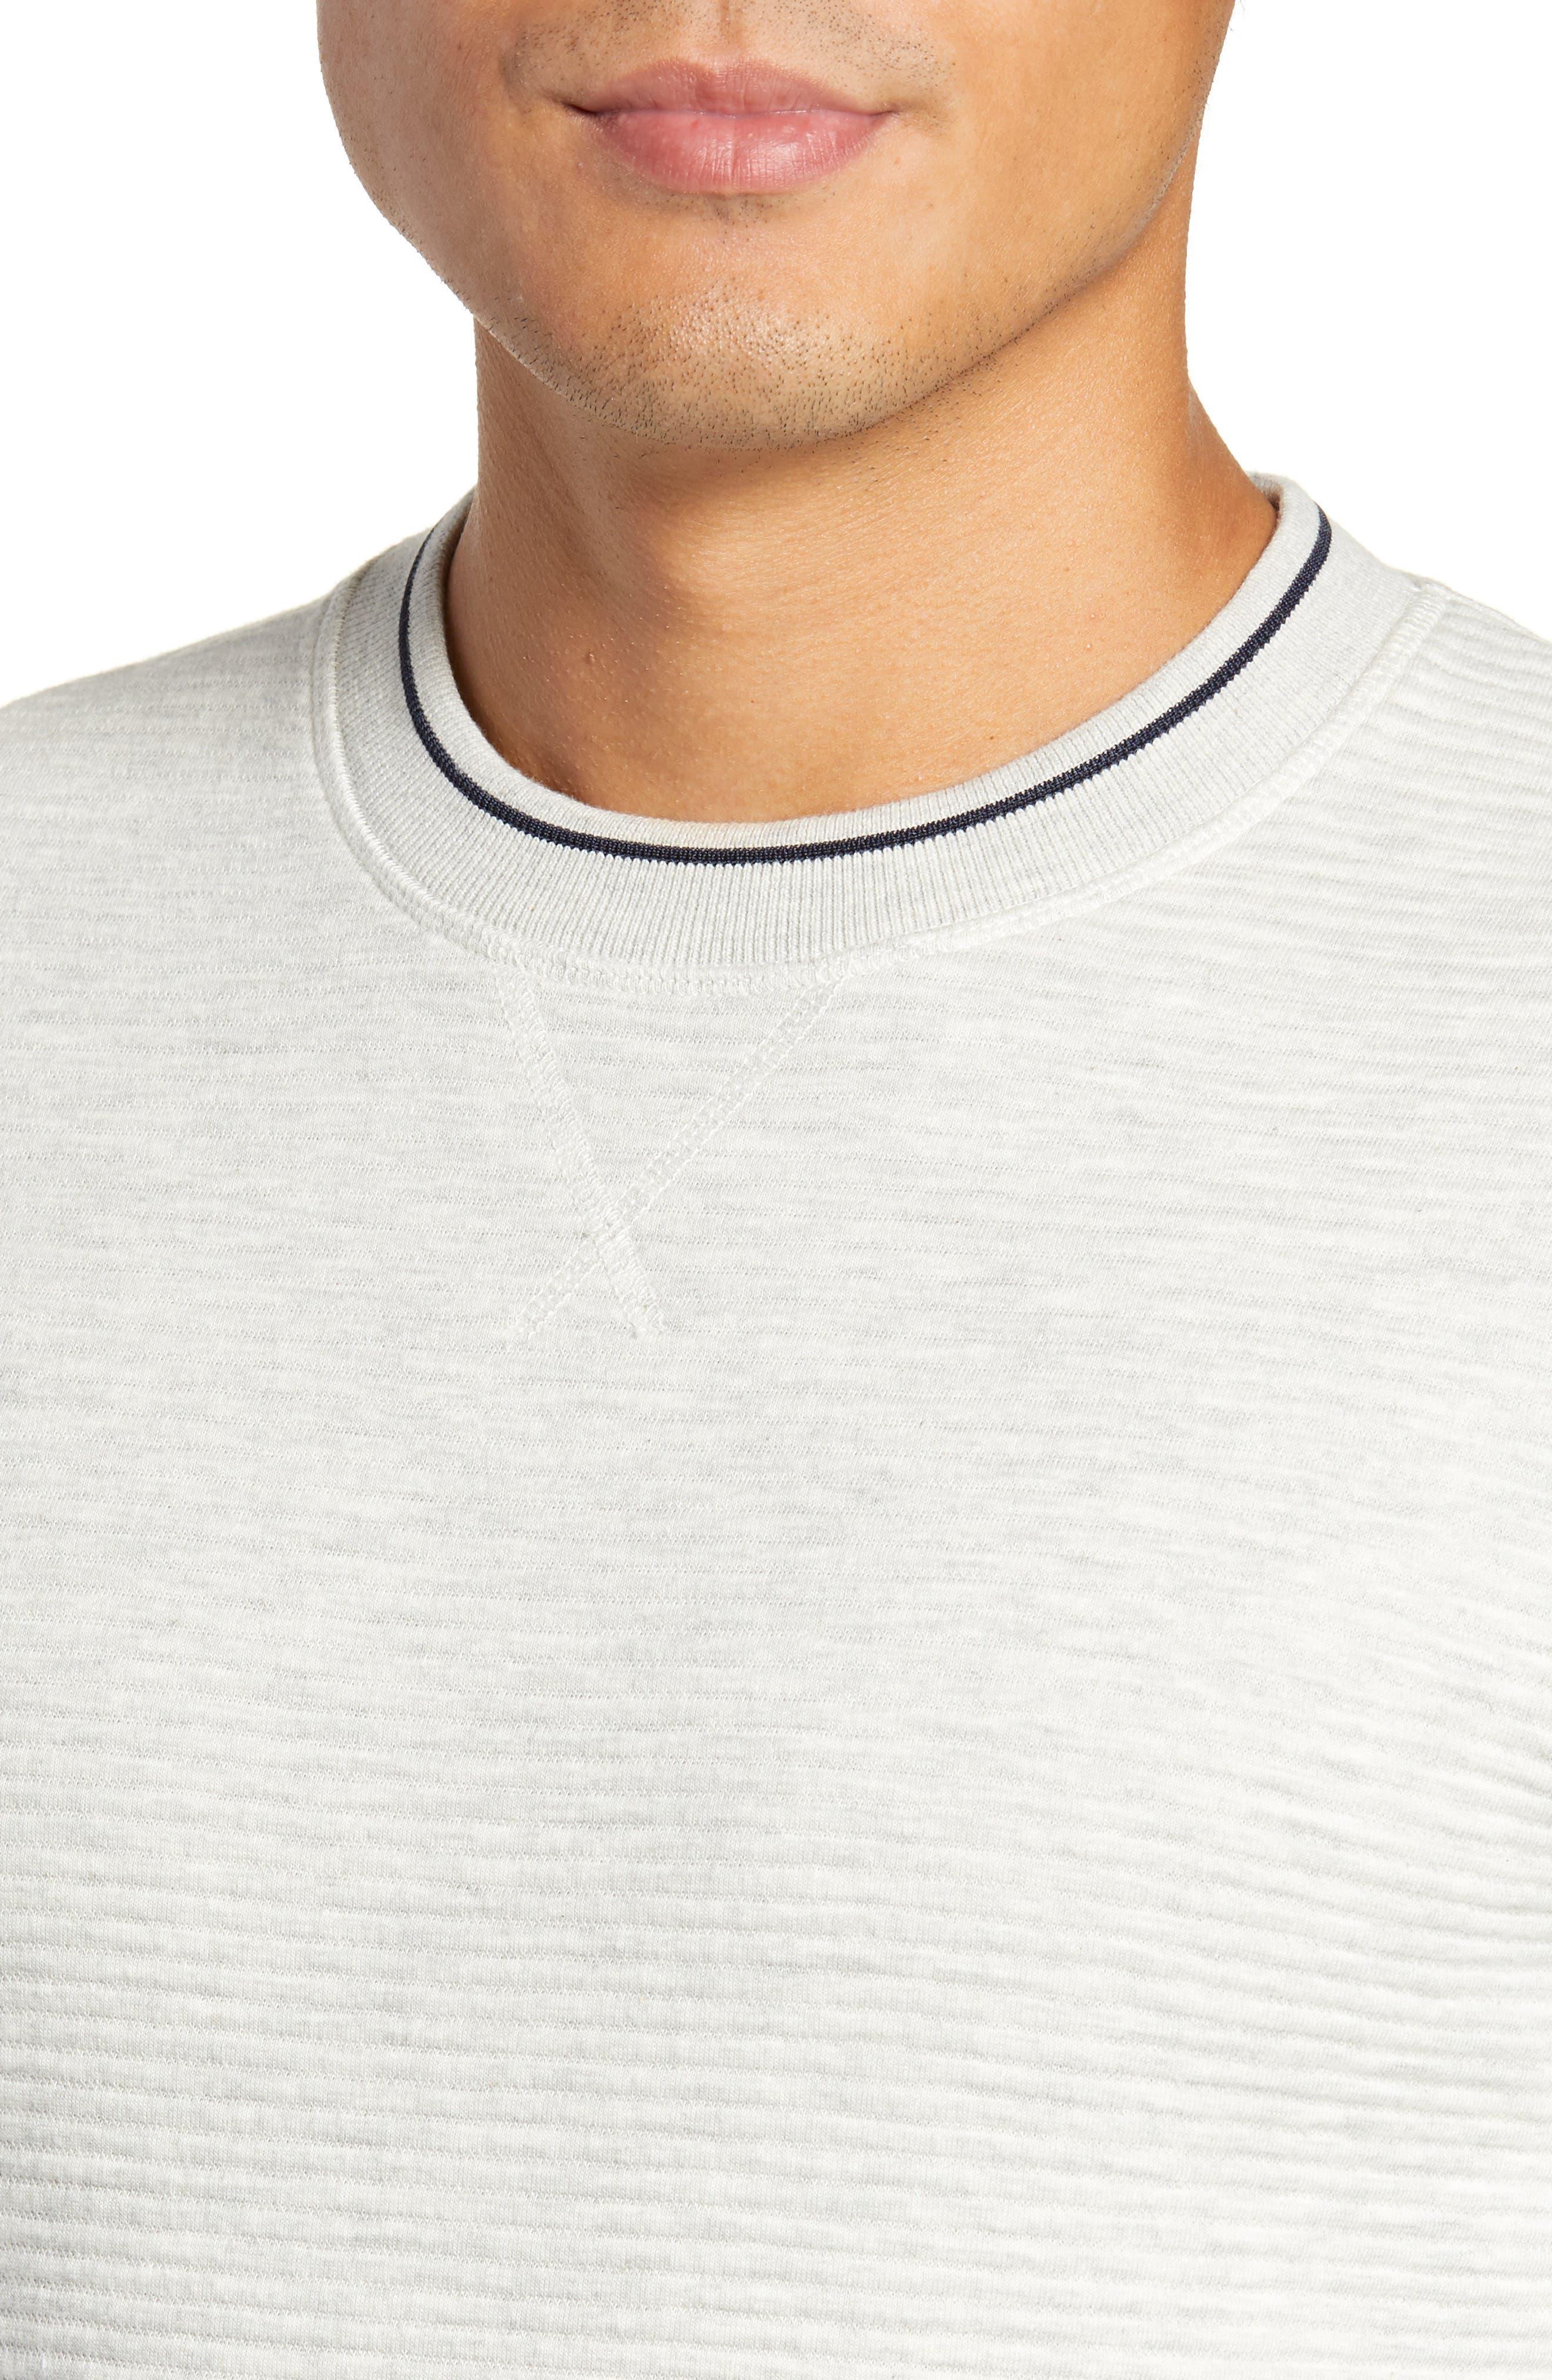 Magiics Slim Fit Quilted Sweatshirt,                             Alternate thumbnail 4, color,                             LIGHT GREY